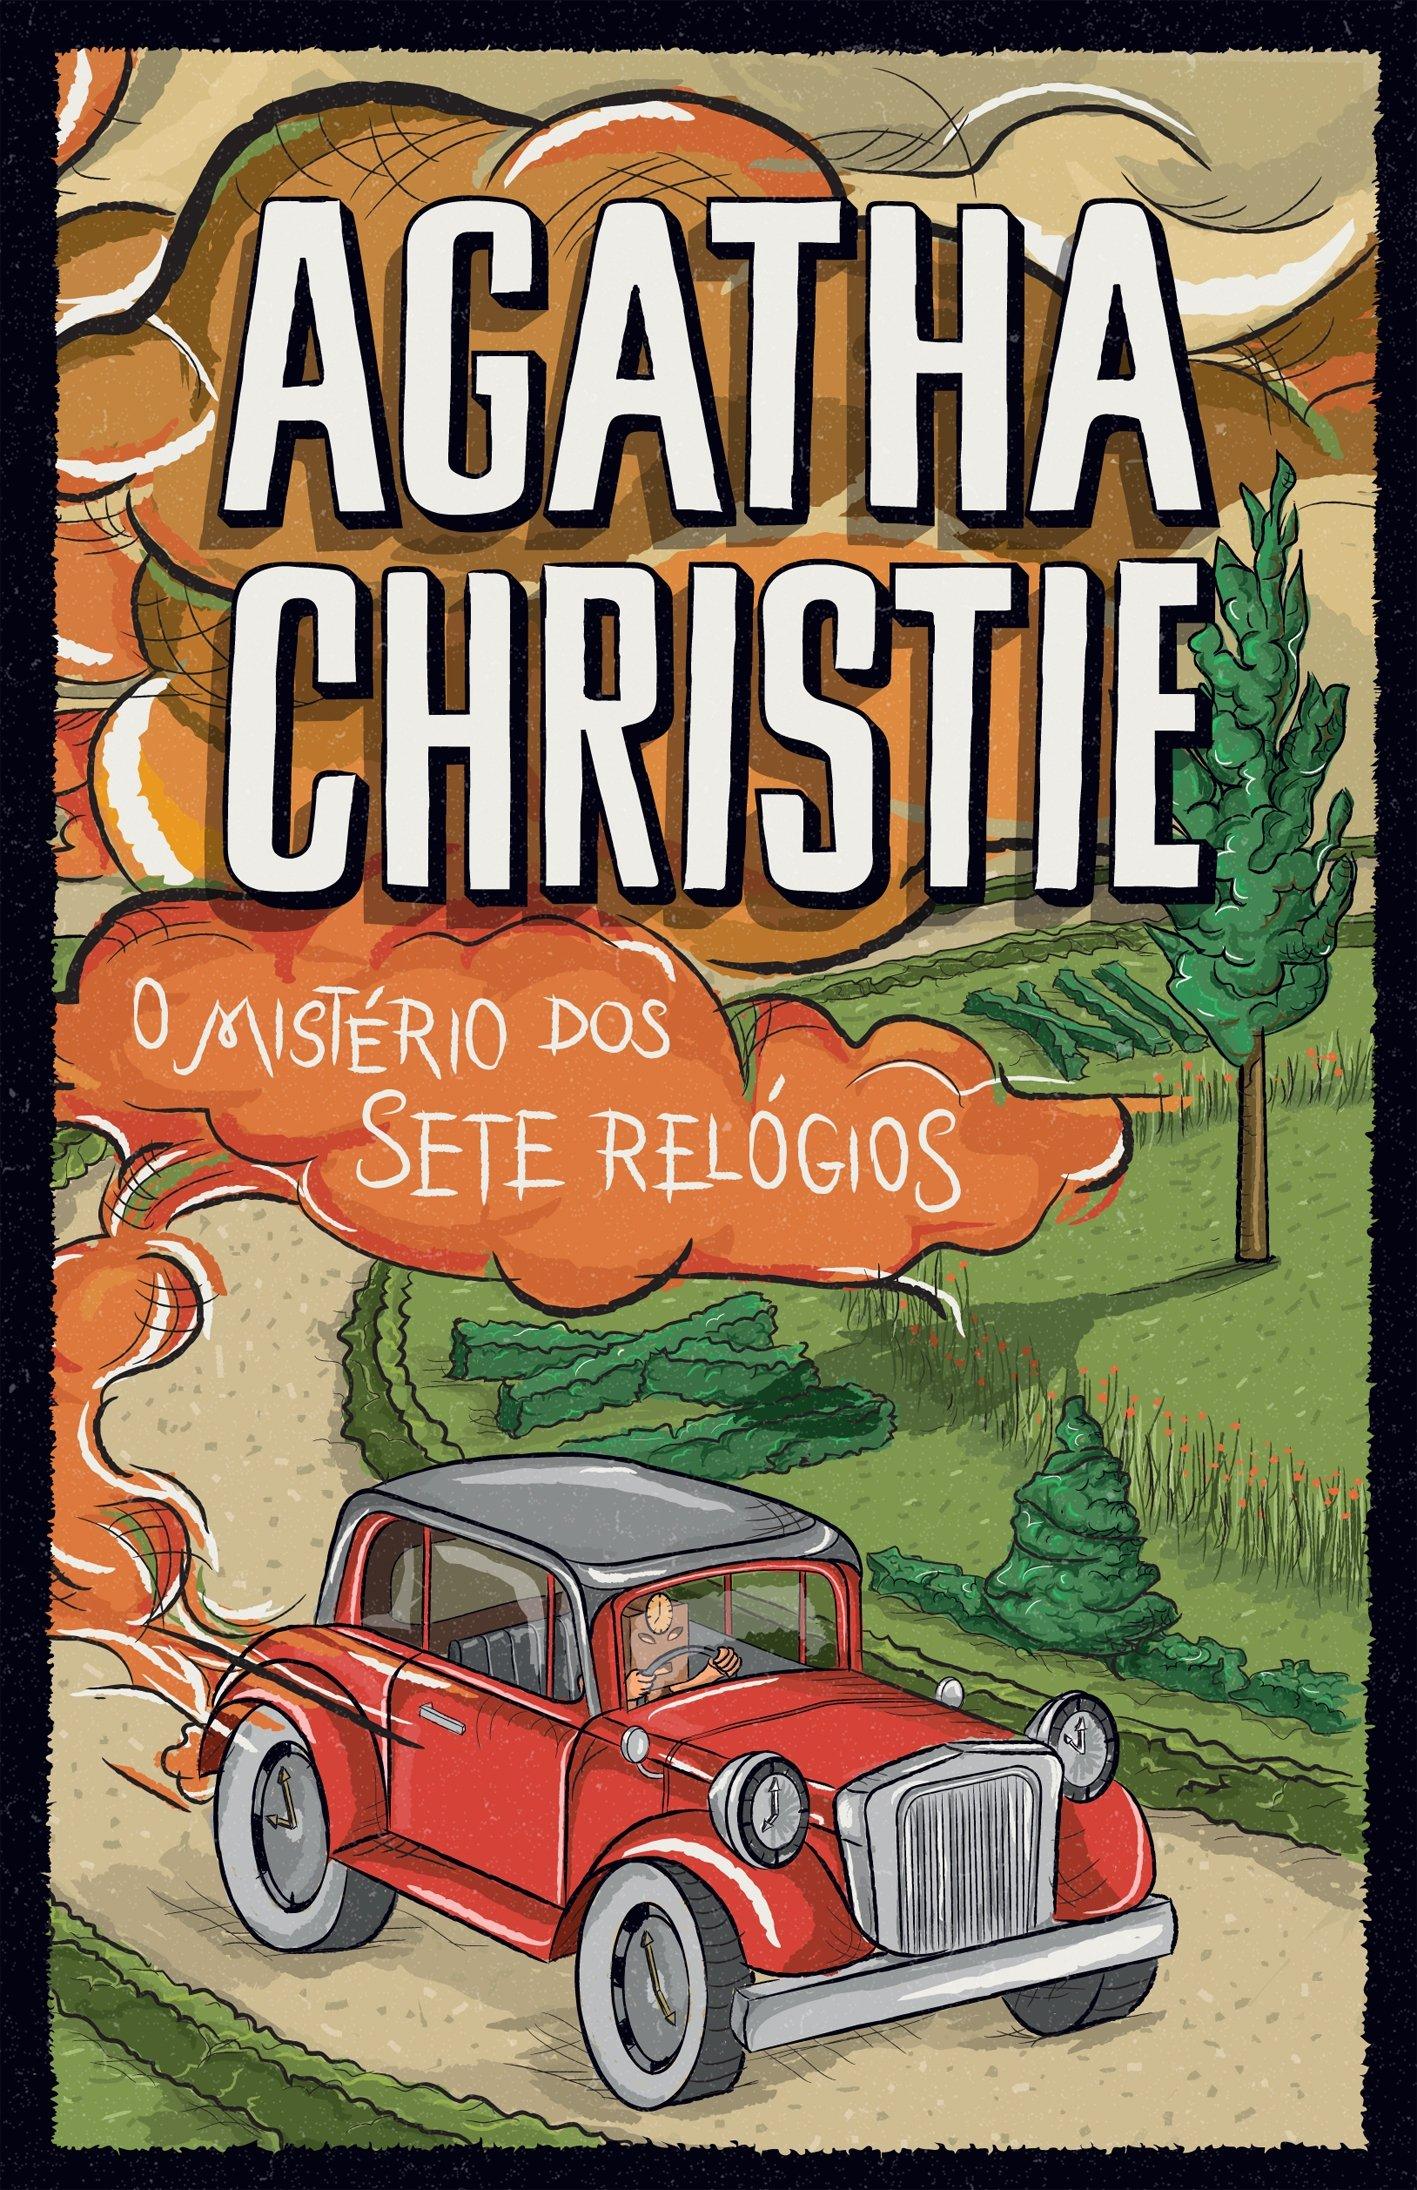 688a188742b O Mistério dos Sete Relógios - 9788520939918 - Livros na Amazon Brasil